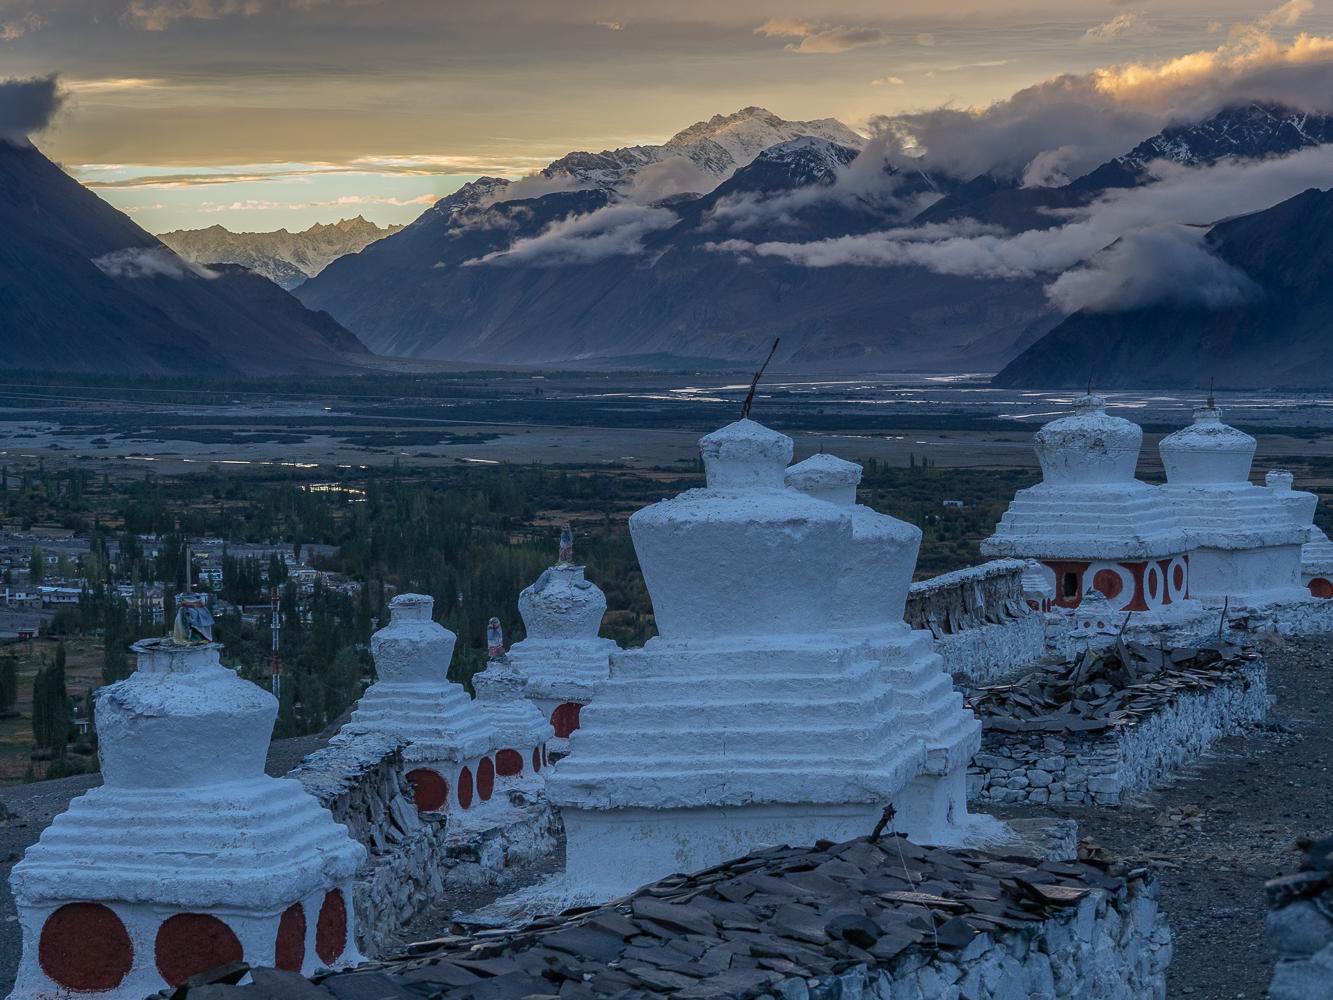 Diskit monastery, India